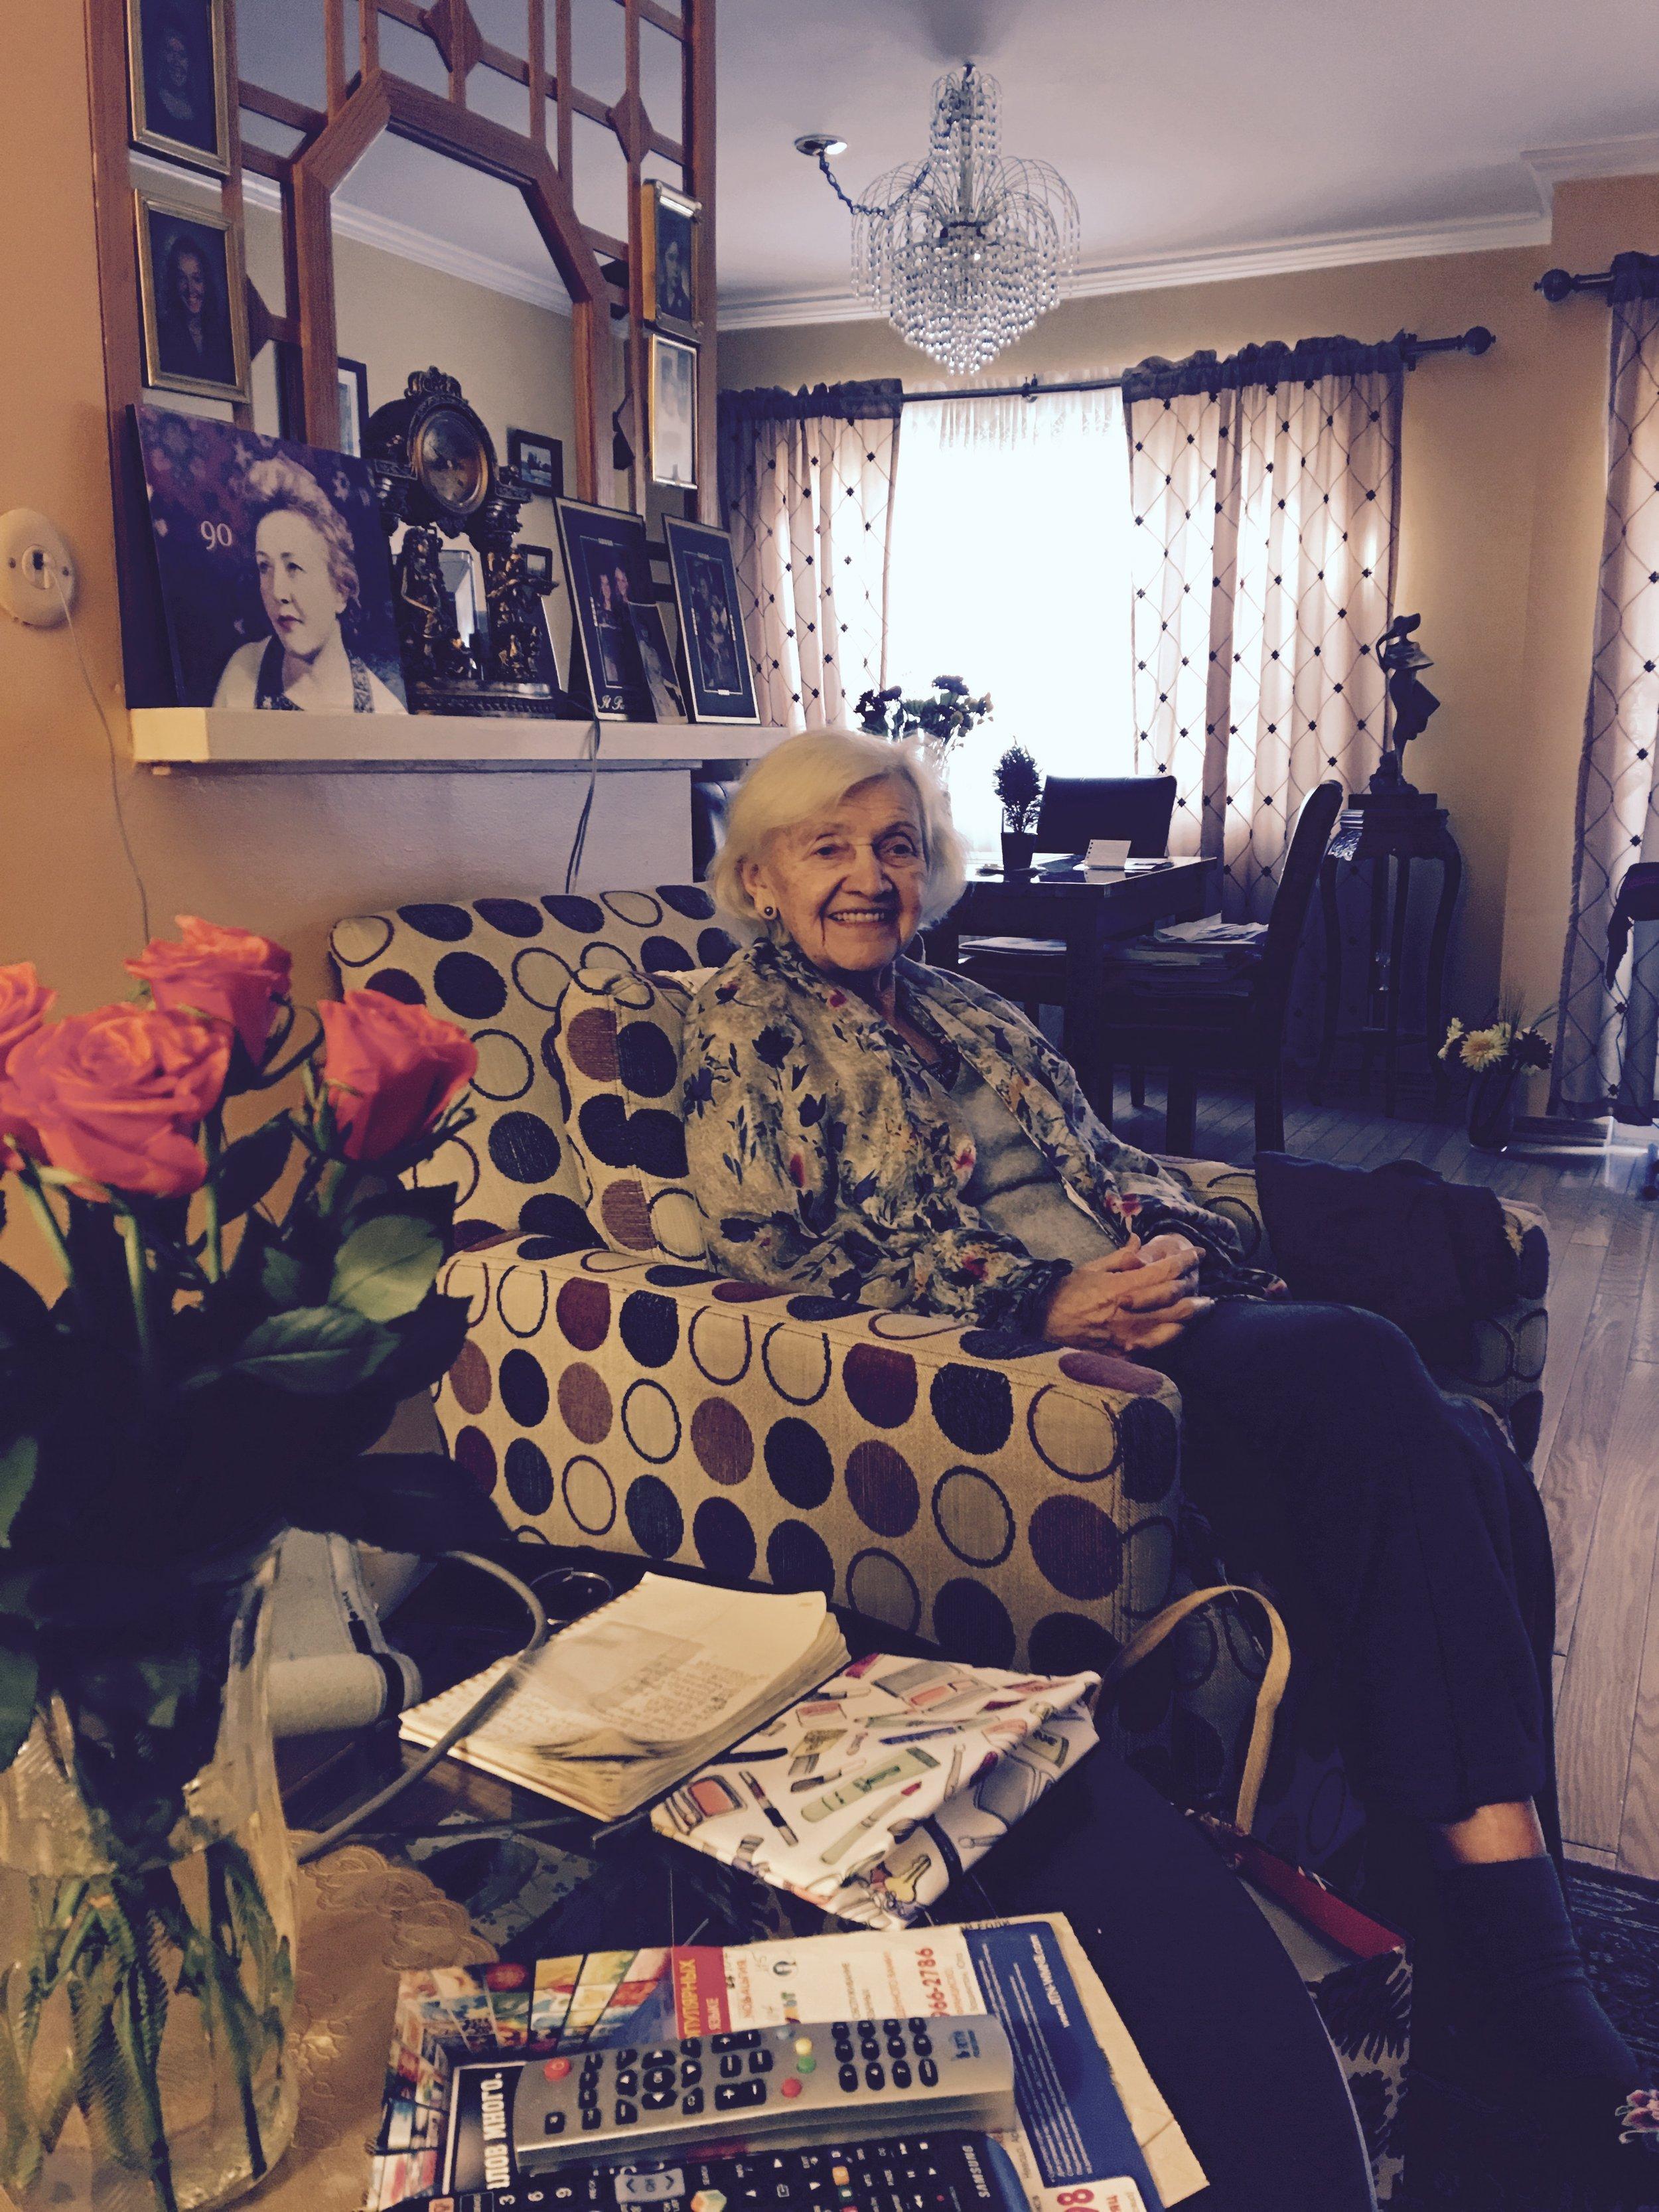 Grandma in her favorite reading chair